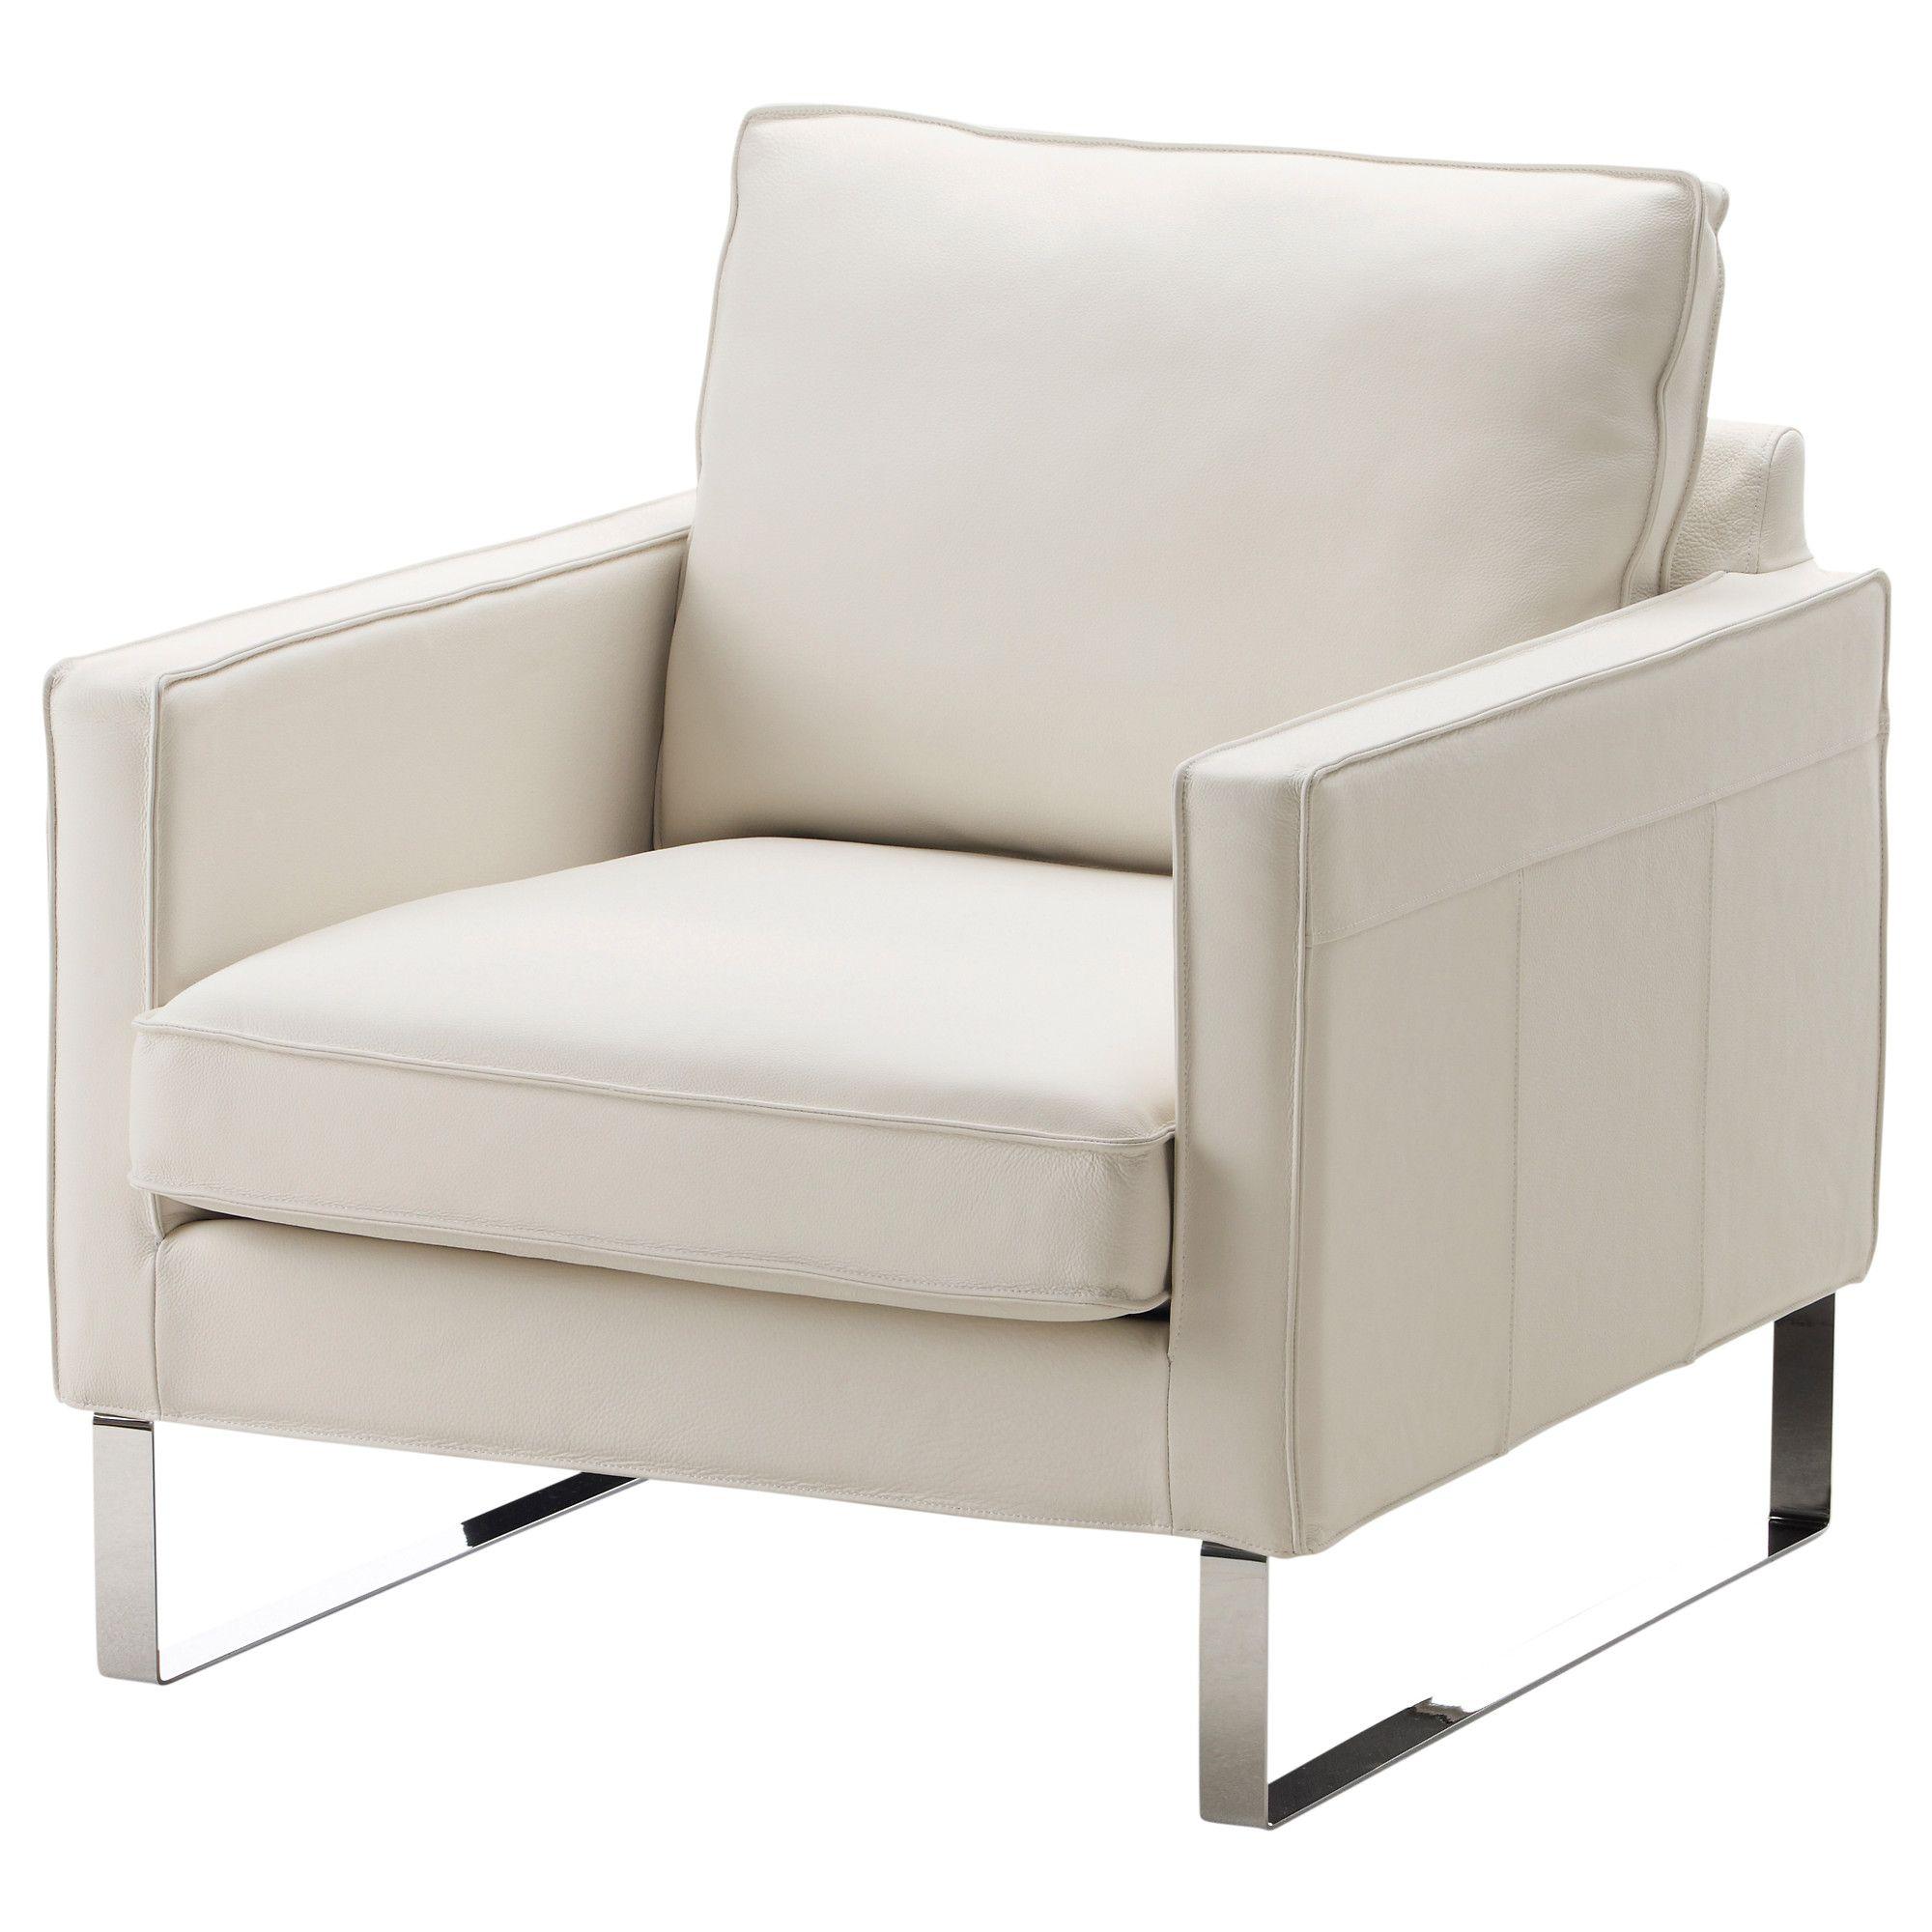 Remarkable Us Furniture And Home Furnishings Ikea Armchair Ikea Home Evergreenethics Interior Chair Design Evergreenethicsorg